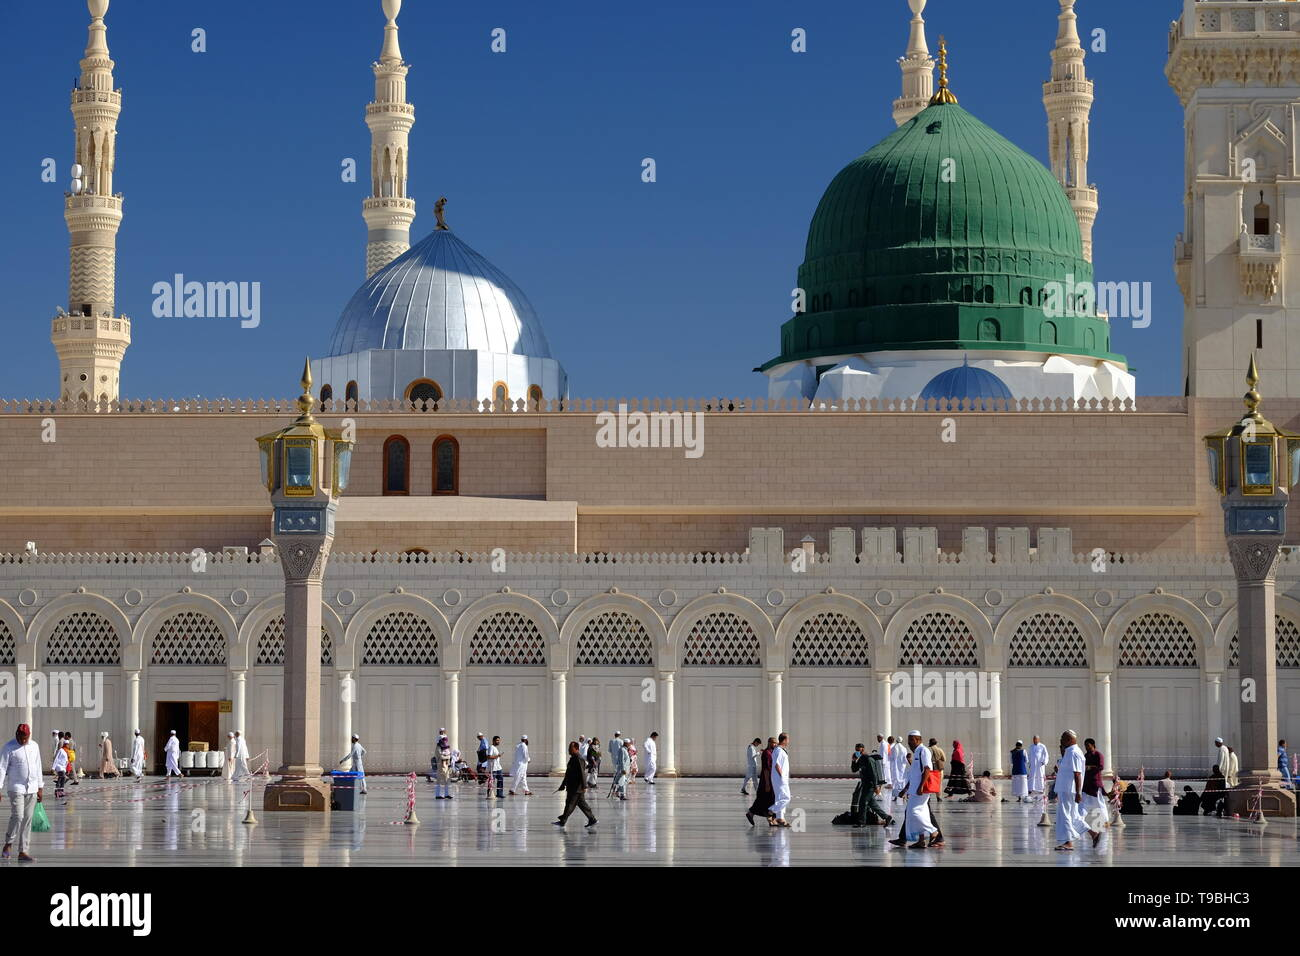 Pesona Masjid Nabawi Madinah - Stock Image